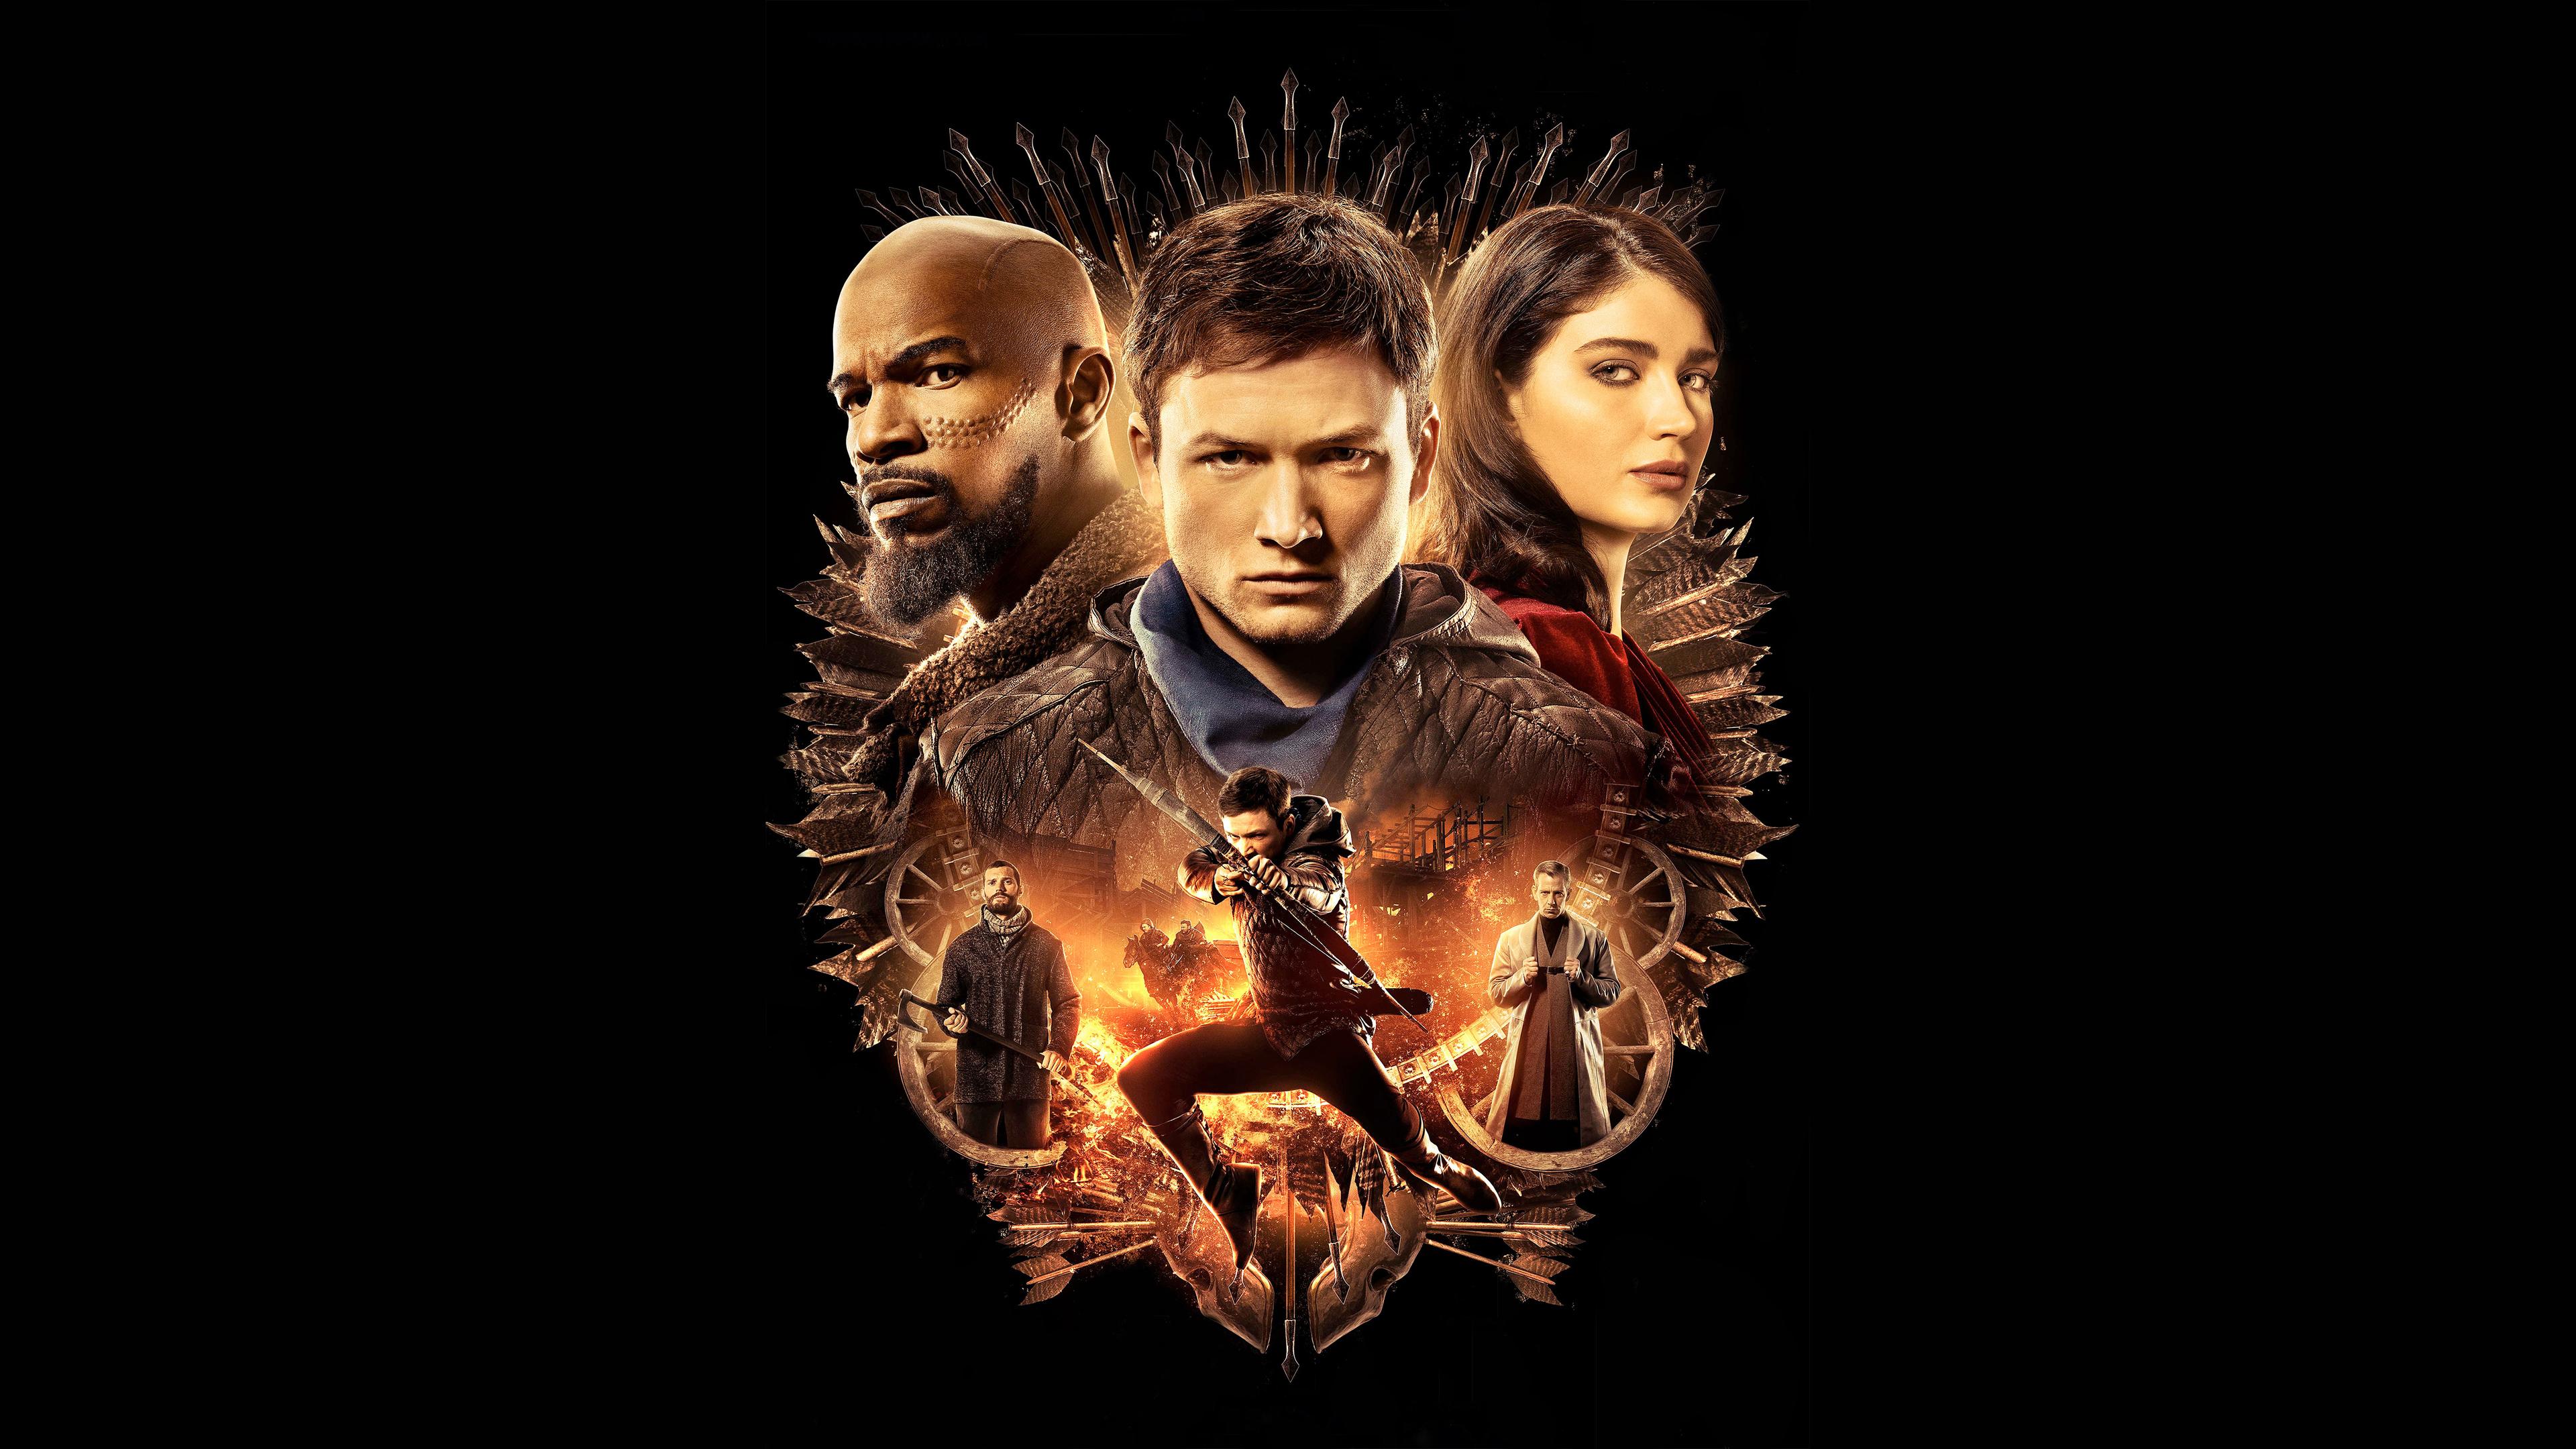 Wallpaper 4k Robin Hood Movie 2018 5k 2018 Movies Wallpapers